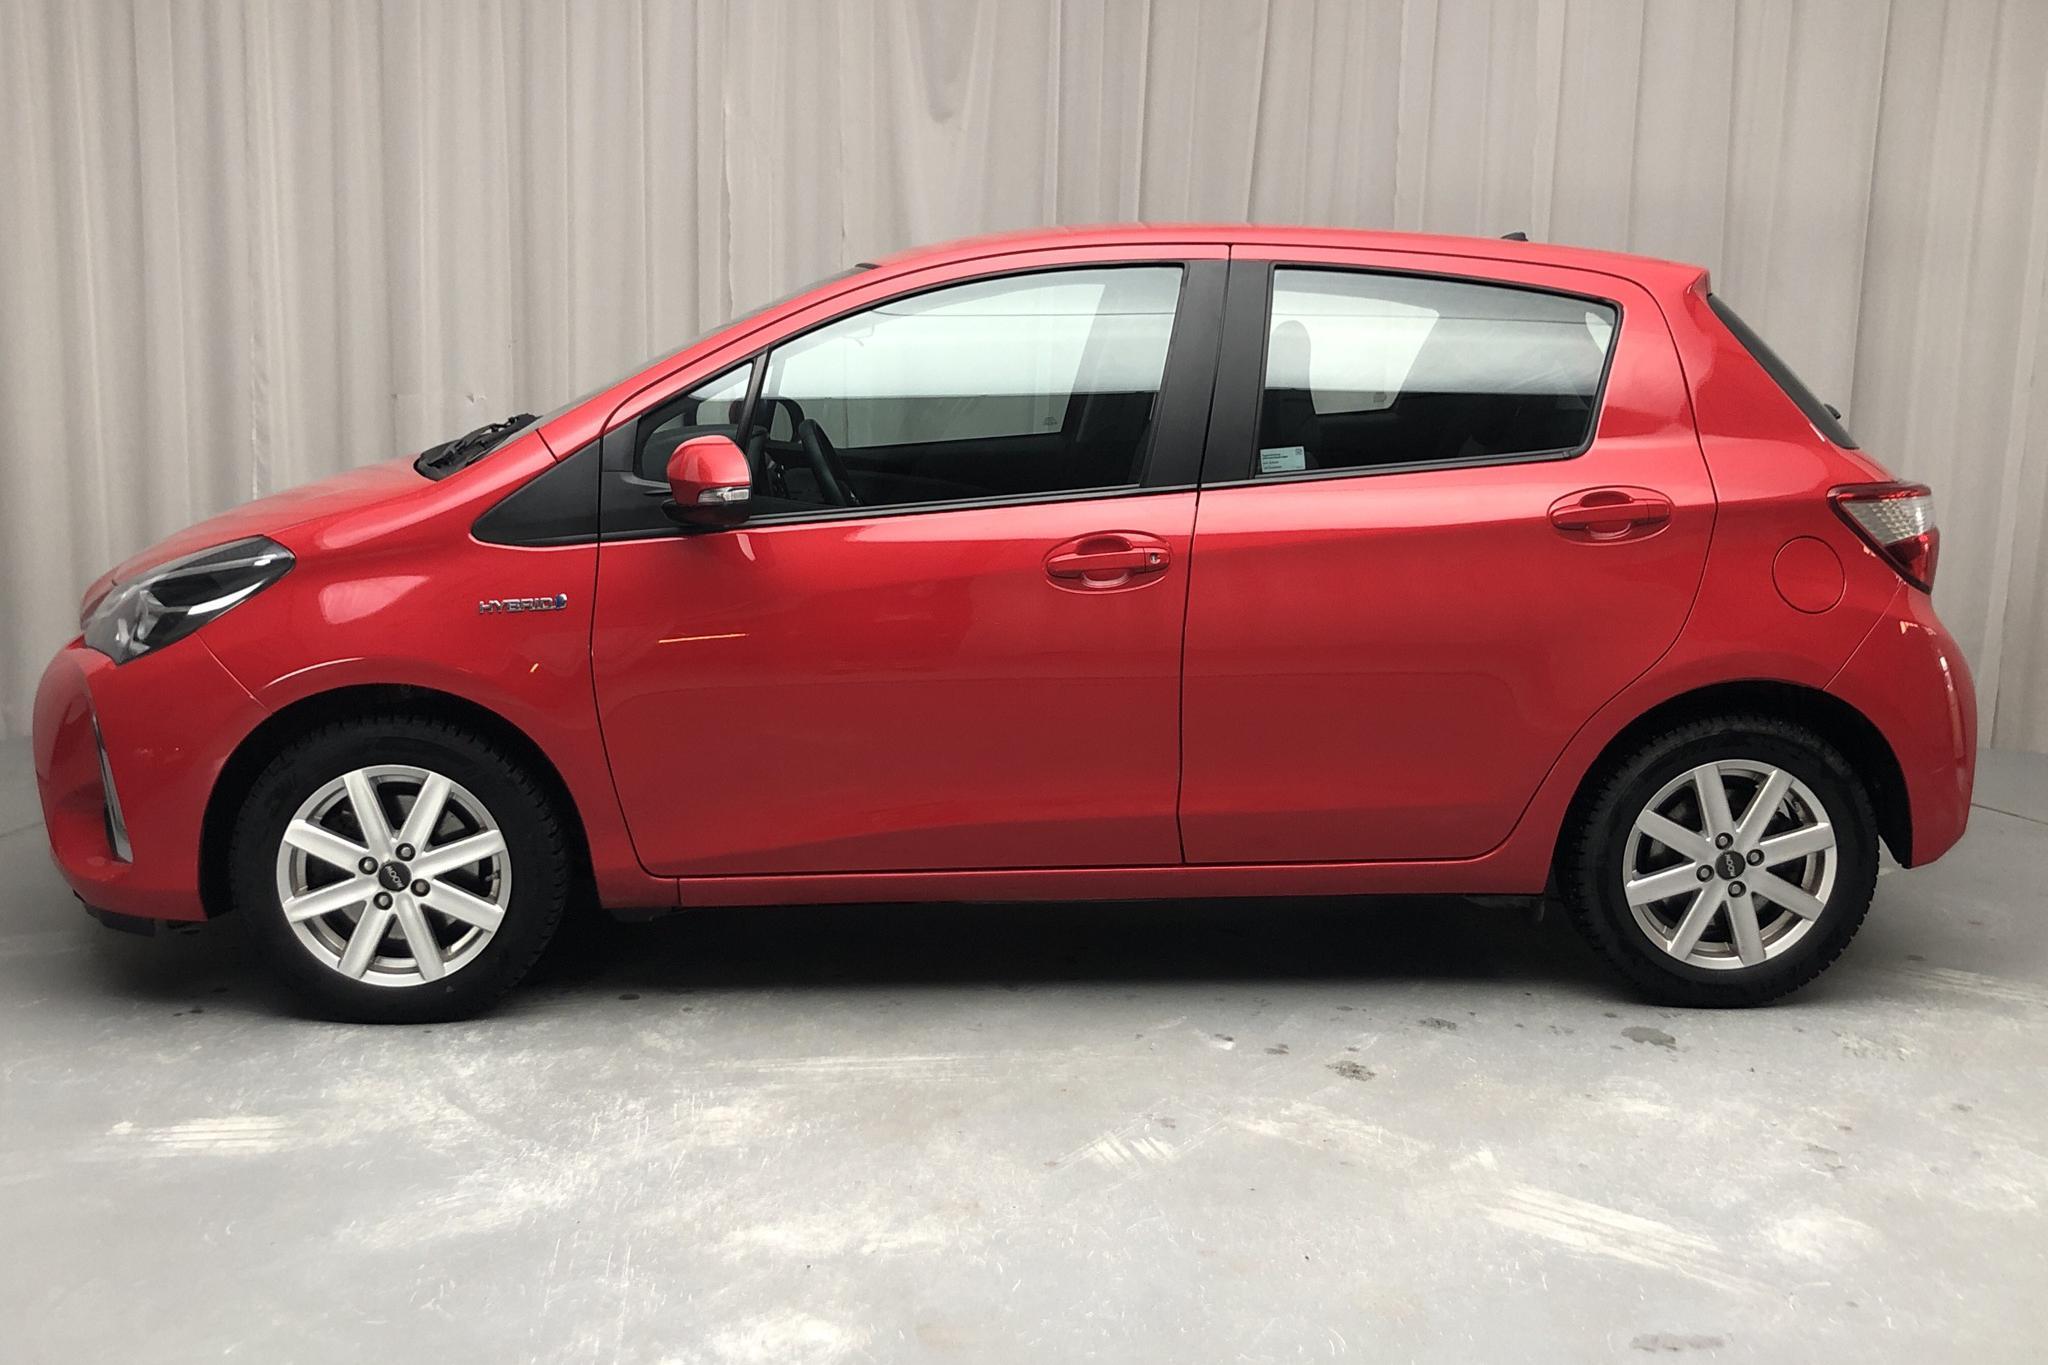 Toyota Yaris 1.5 Hybrid 5dr (101hk) - 5 347 mil - Automat - röd - 2018